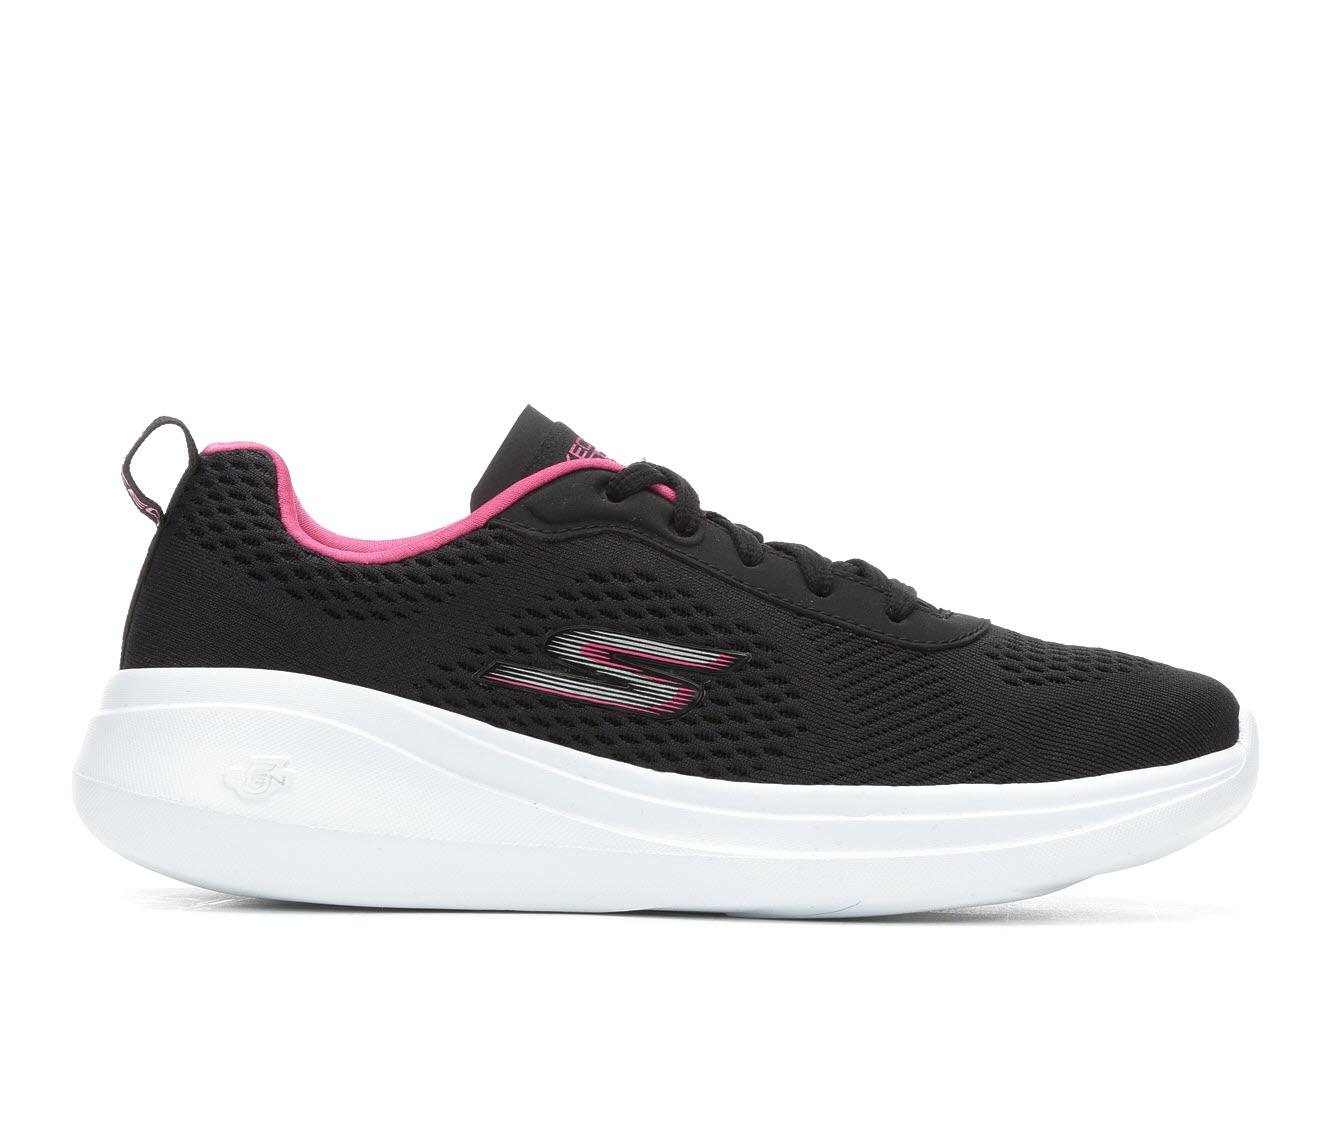 Skechers Go Go Run Fast Glide 15107 Women's Athletic Shoe (Black)